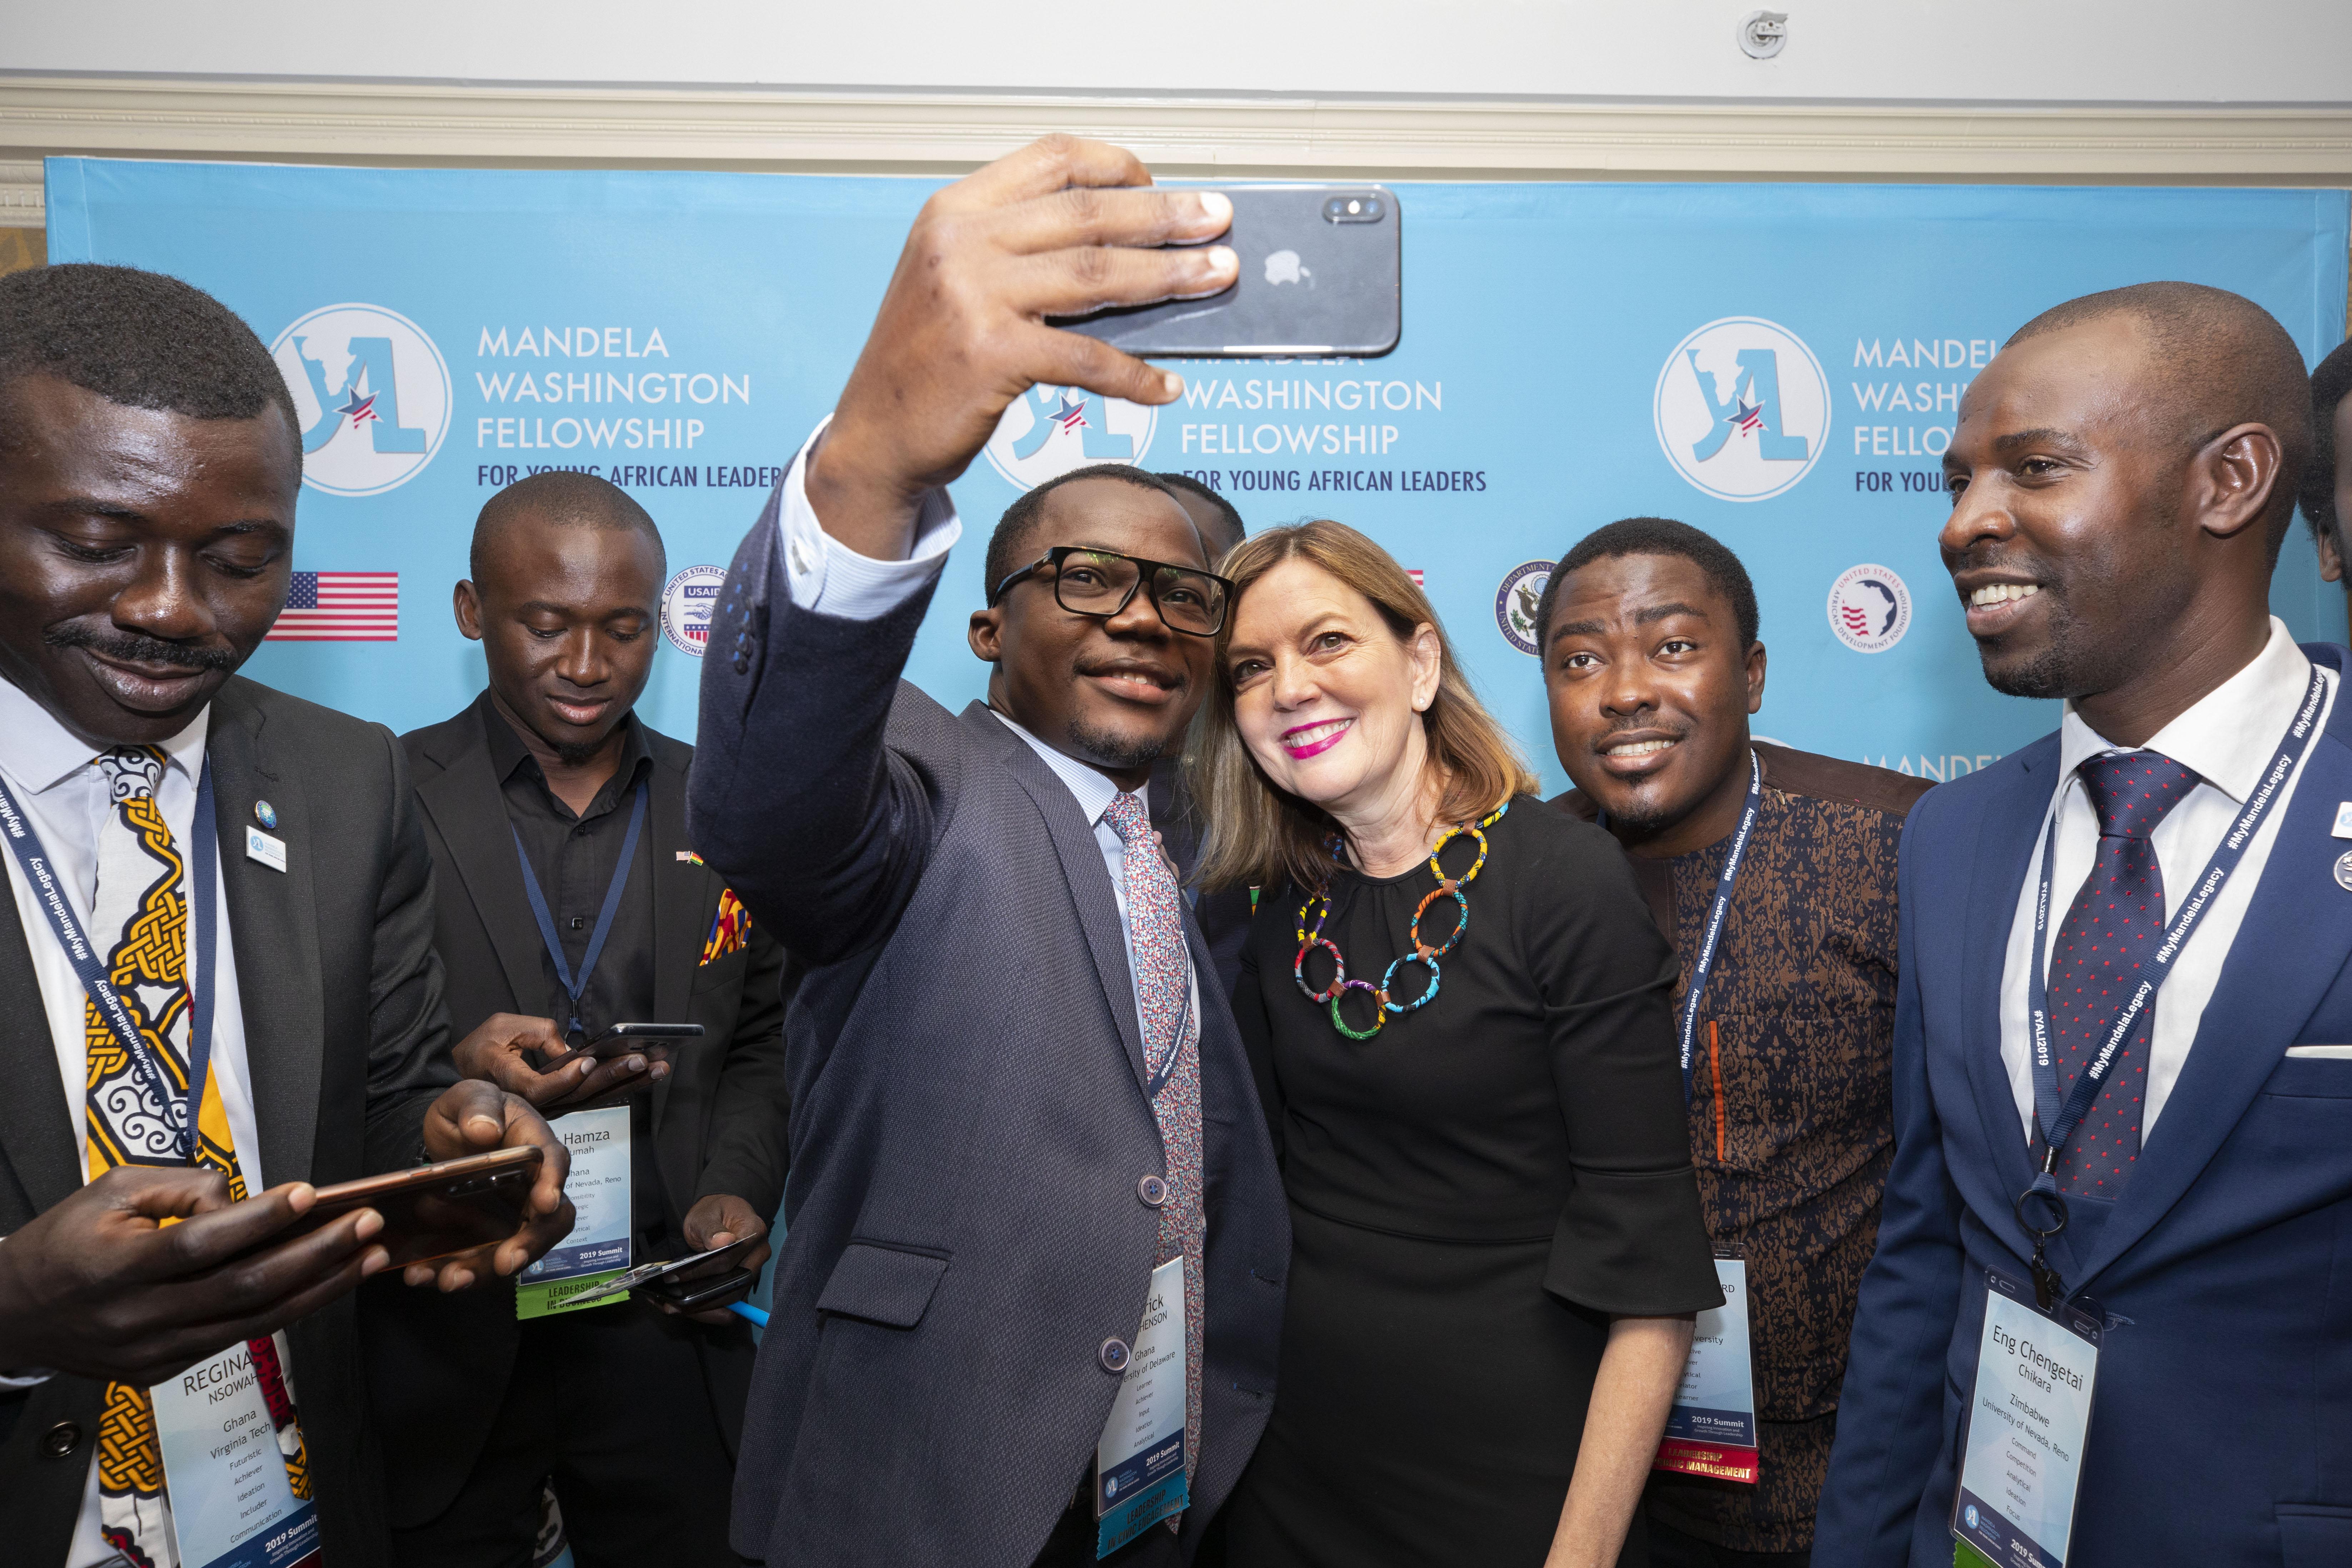 Assistant Secretary Royce with Mandela Washington Fellowship Summit attendees